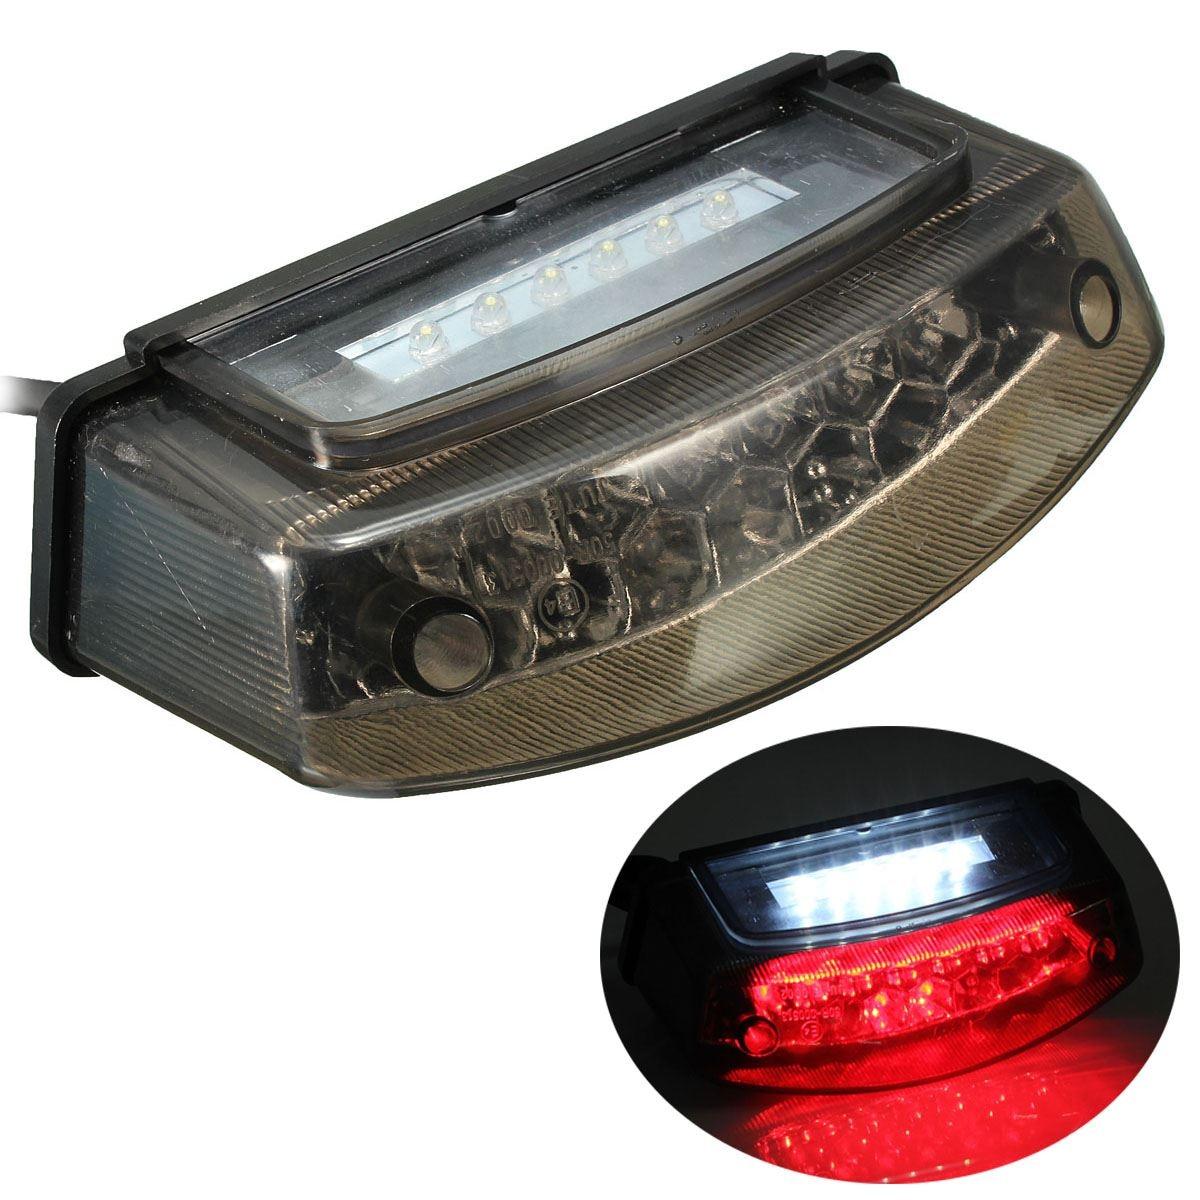 12V LED Universal Motorcycle Tail Brake Light License Plate font b Lamp b font Rear Stop